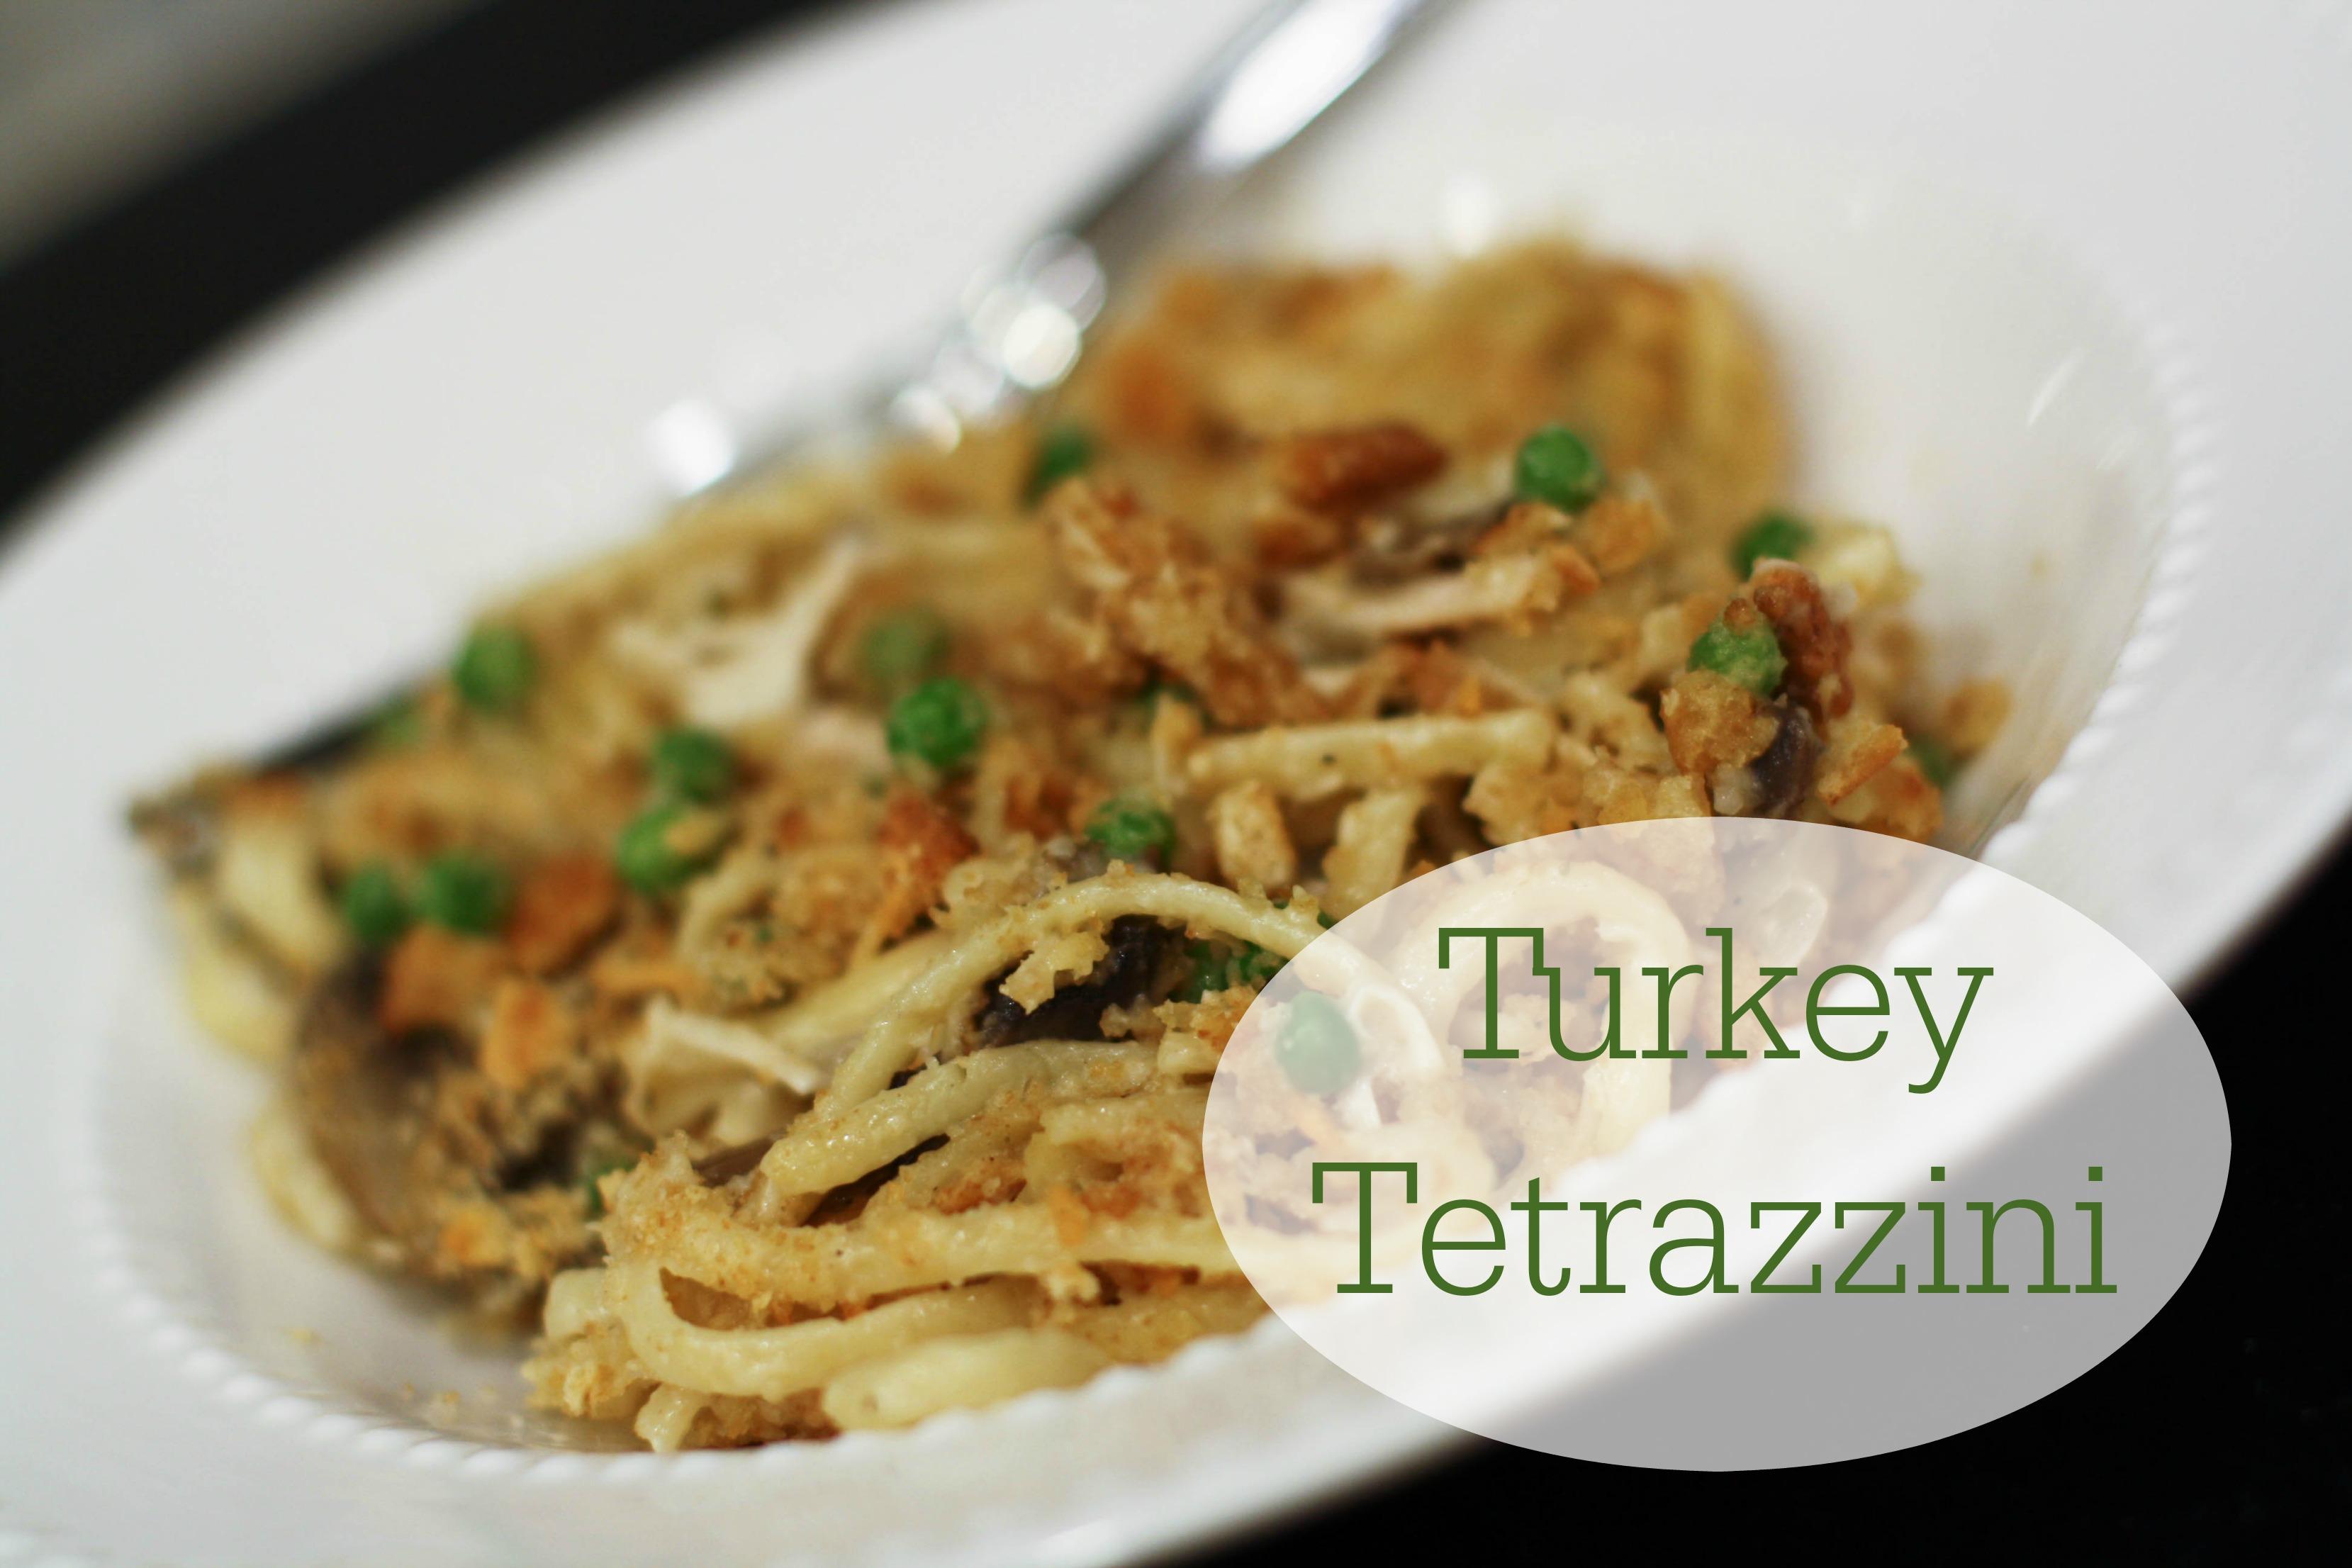 Southern Made Blog - Turkey Tetrazzini